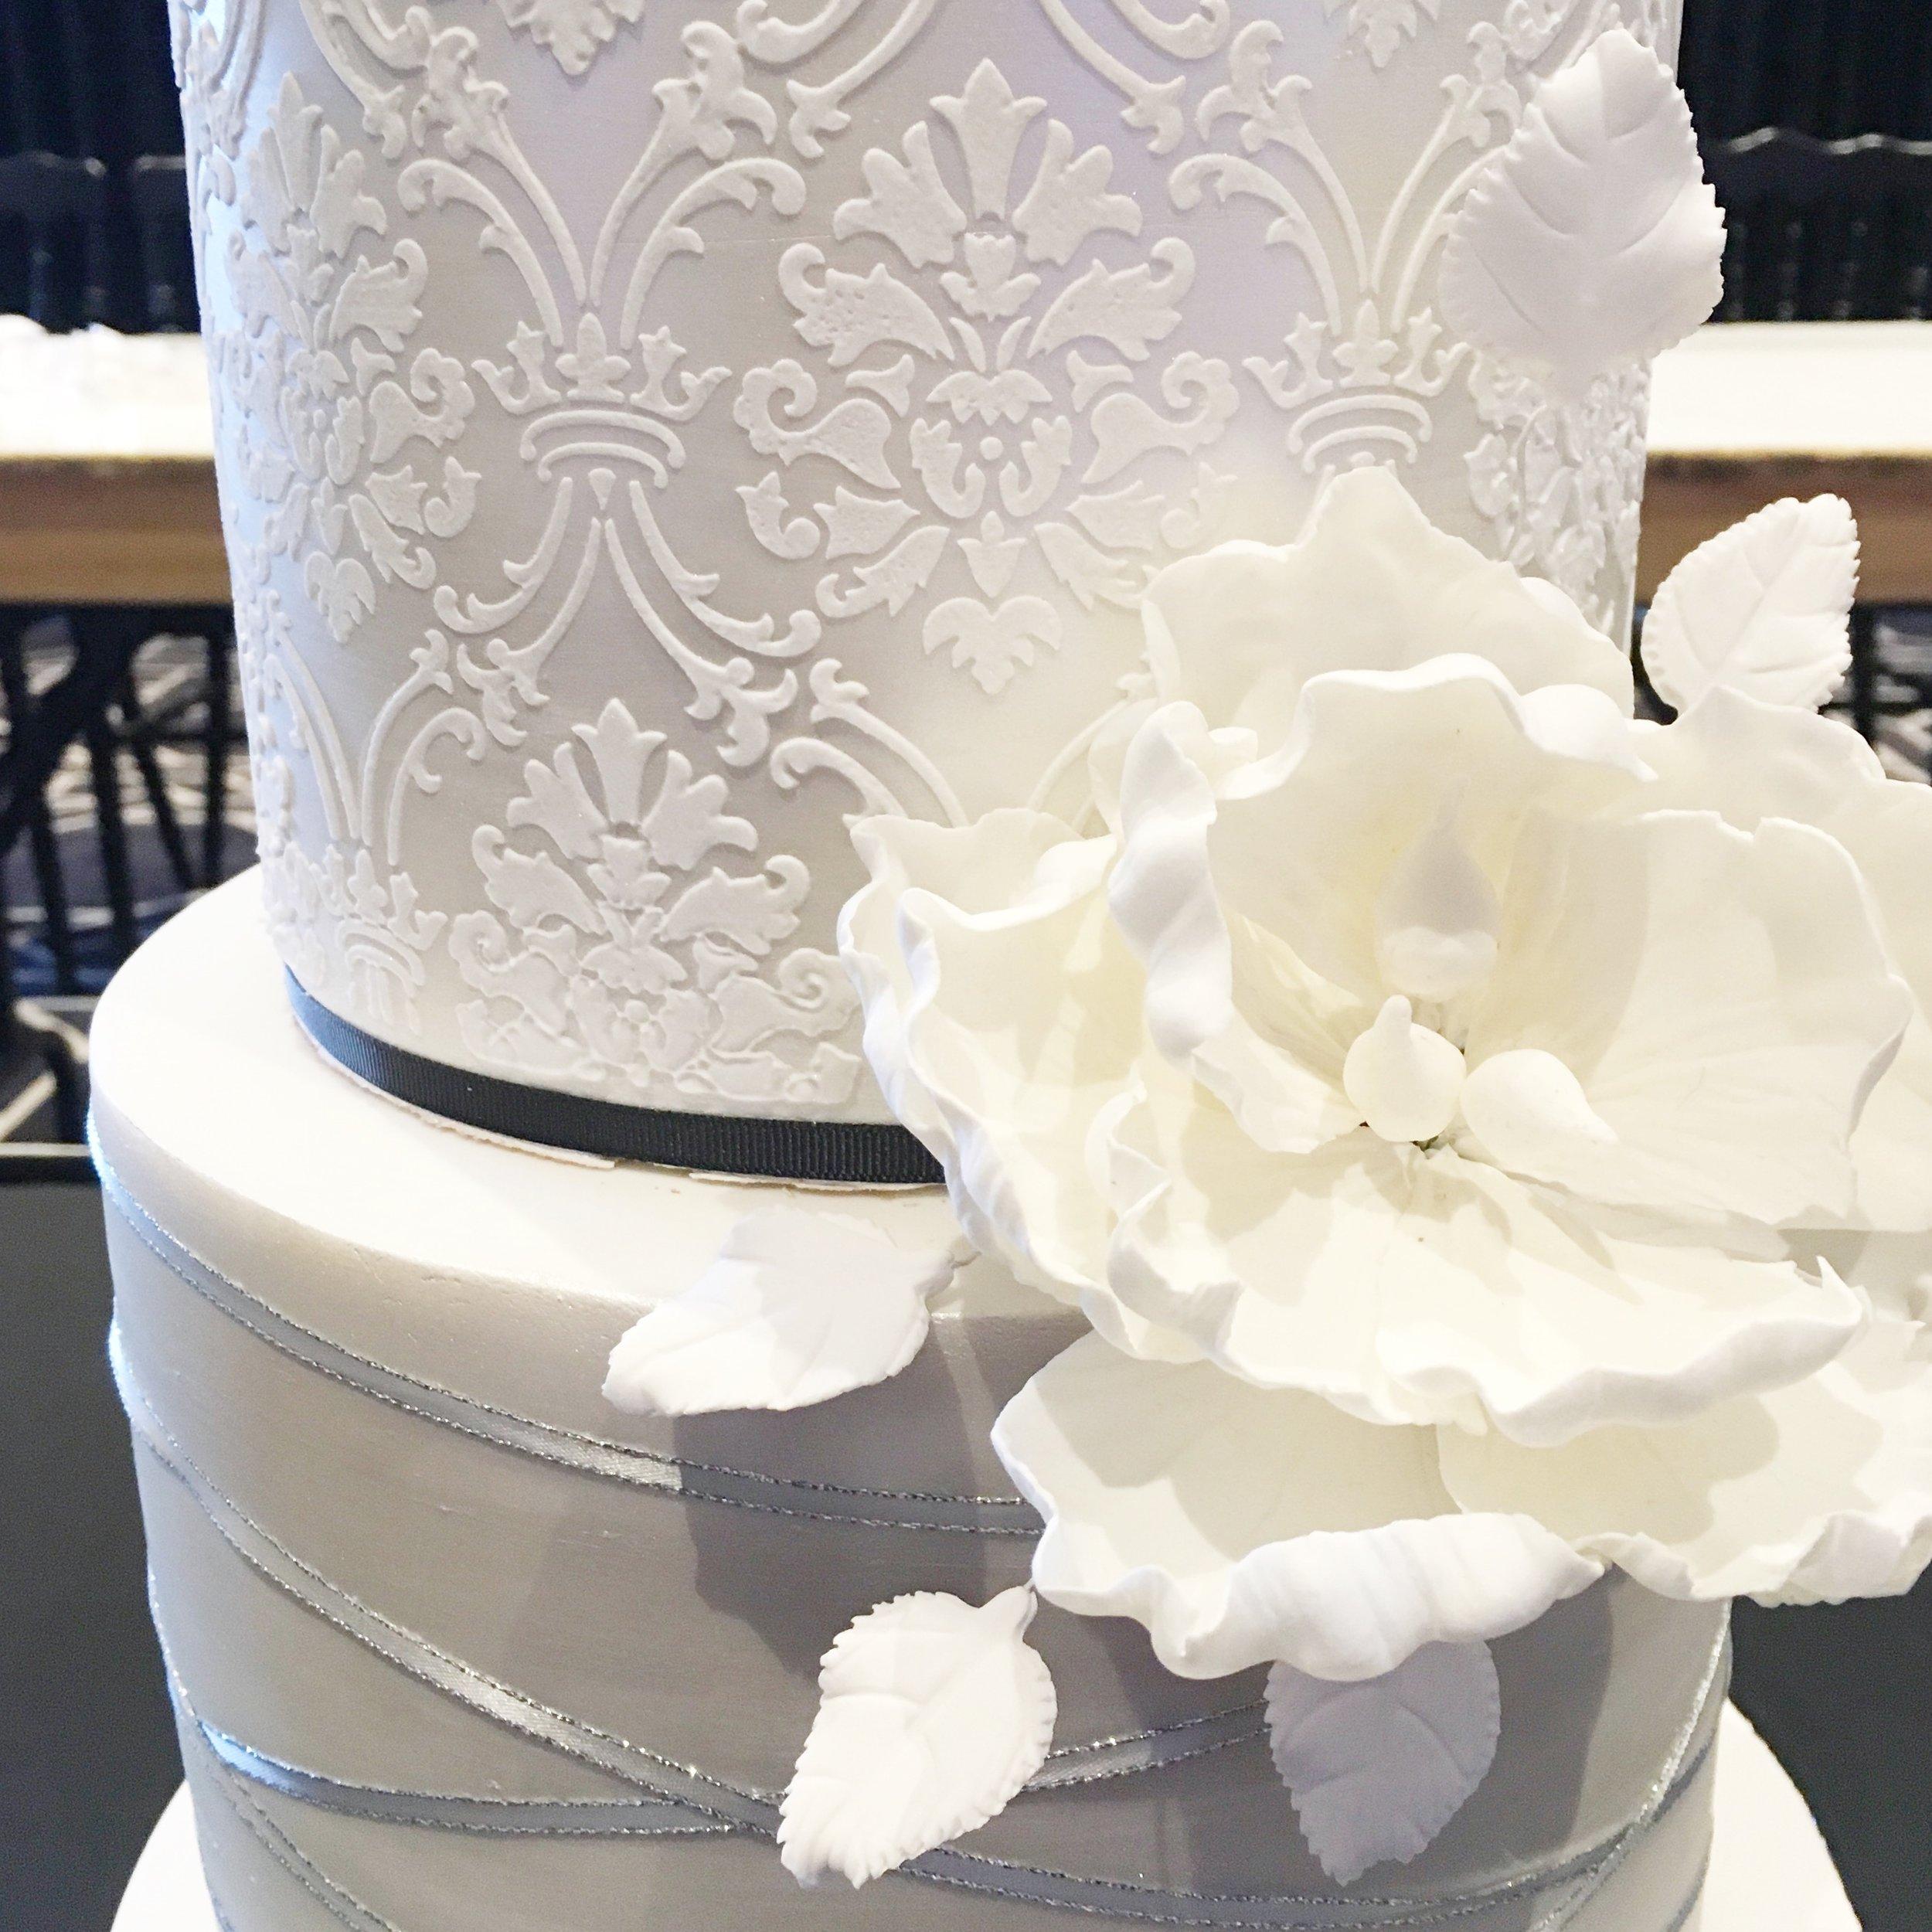 Copy of Wedding Cake with Sugar Flower